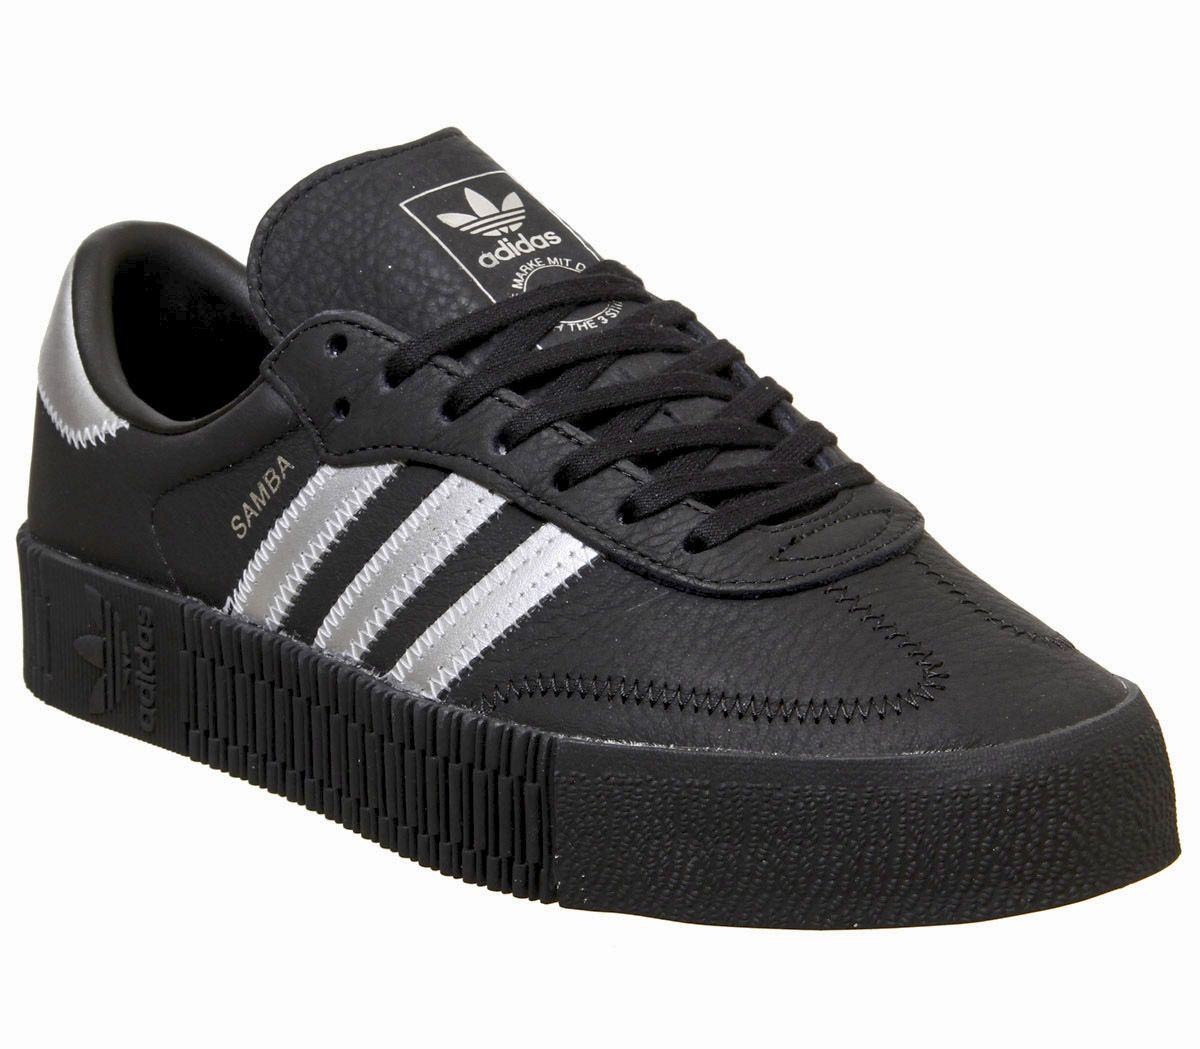 c5d75795 adidas Samba Rose Trainers Core Black Silver Metallic Core Black ...